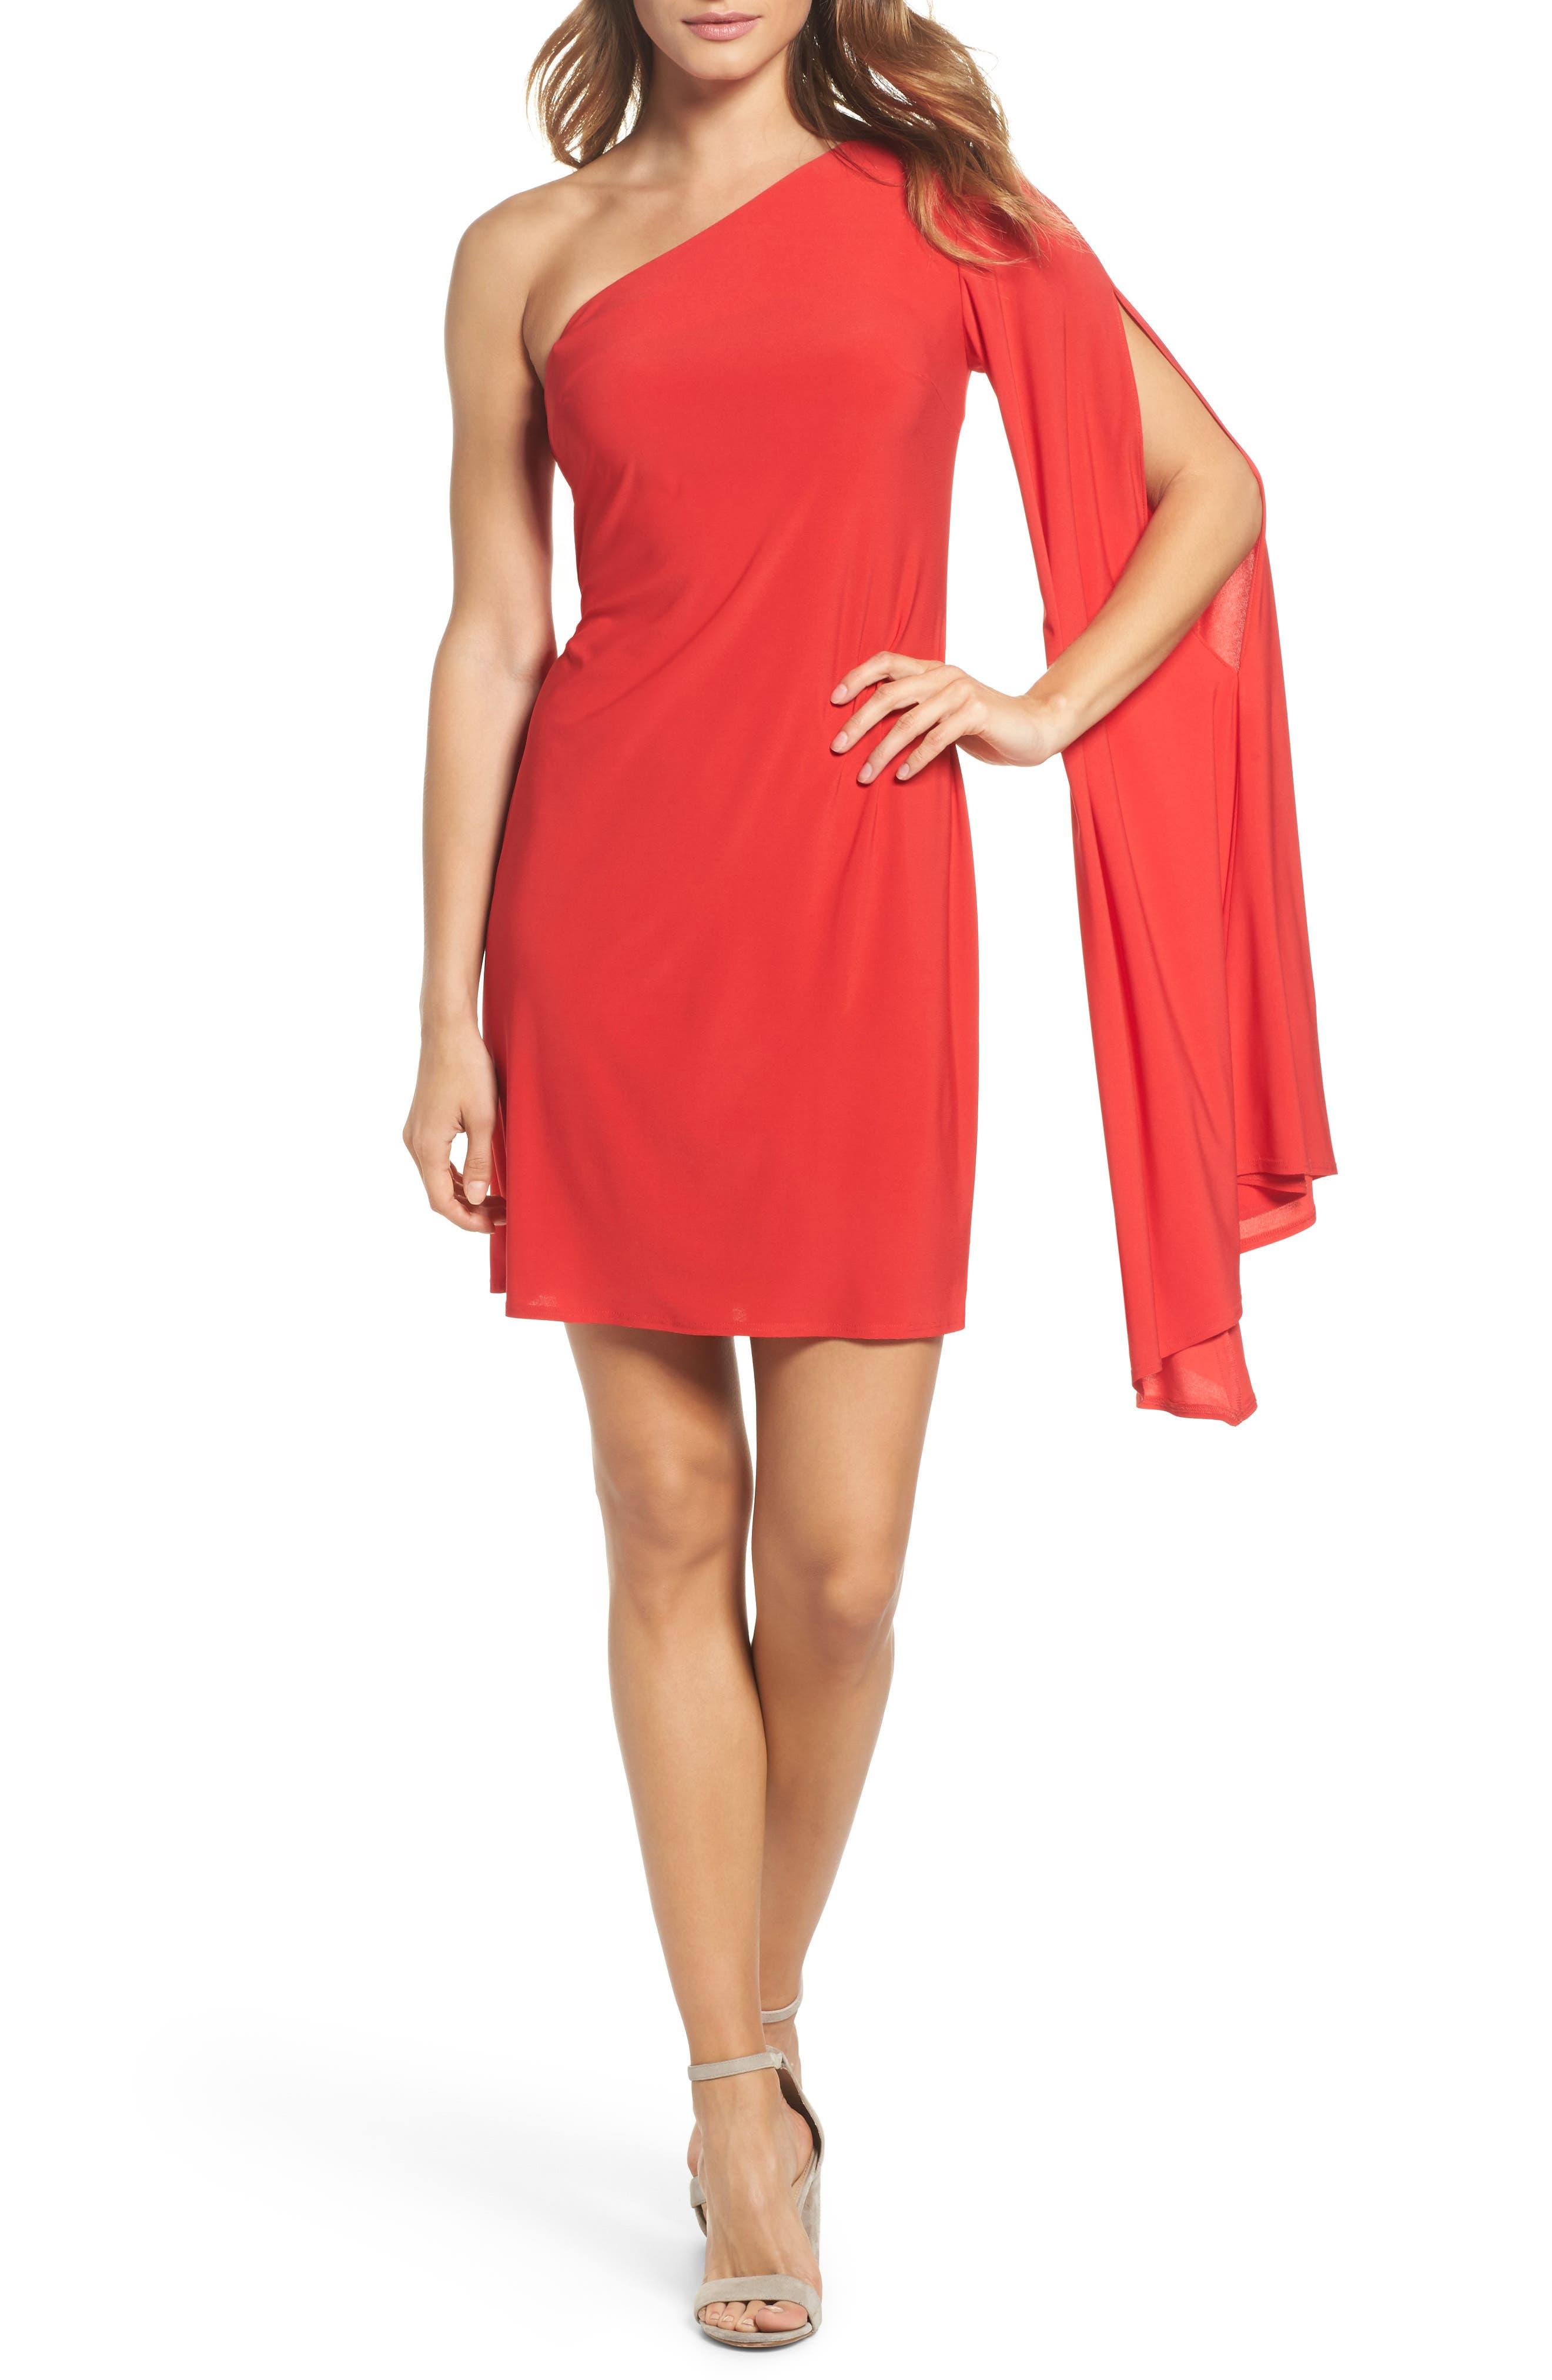 Musa One-Shoulder Dress,                         Main,                         color,